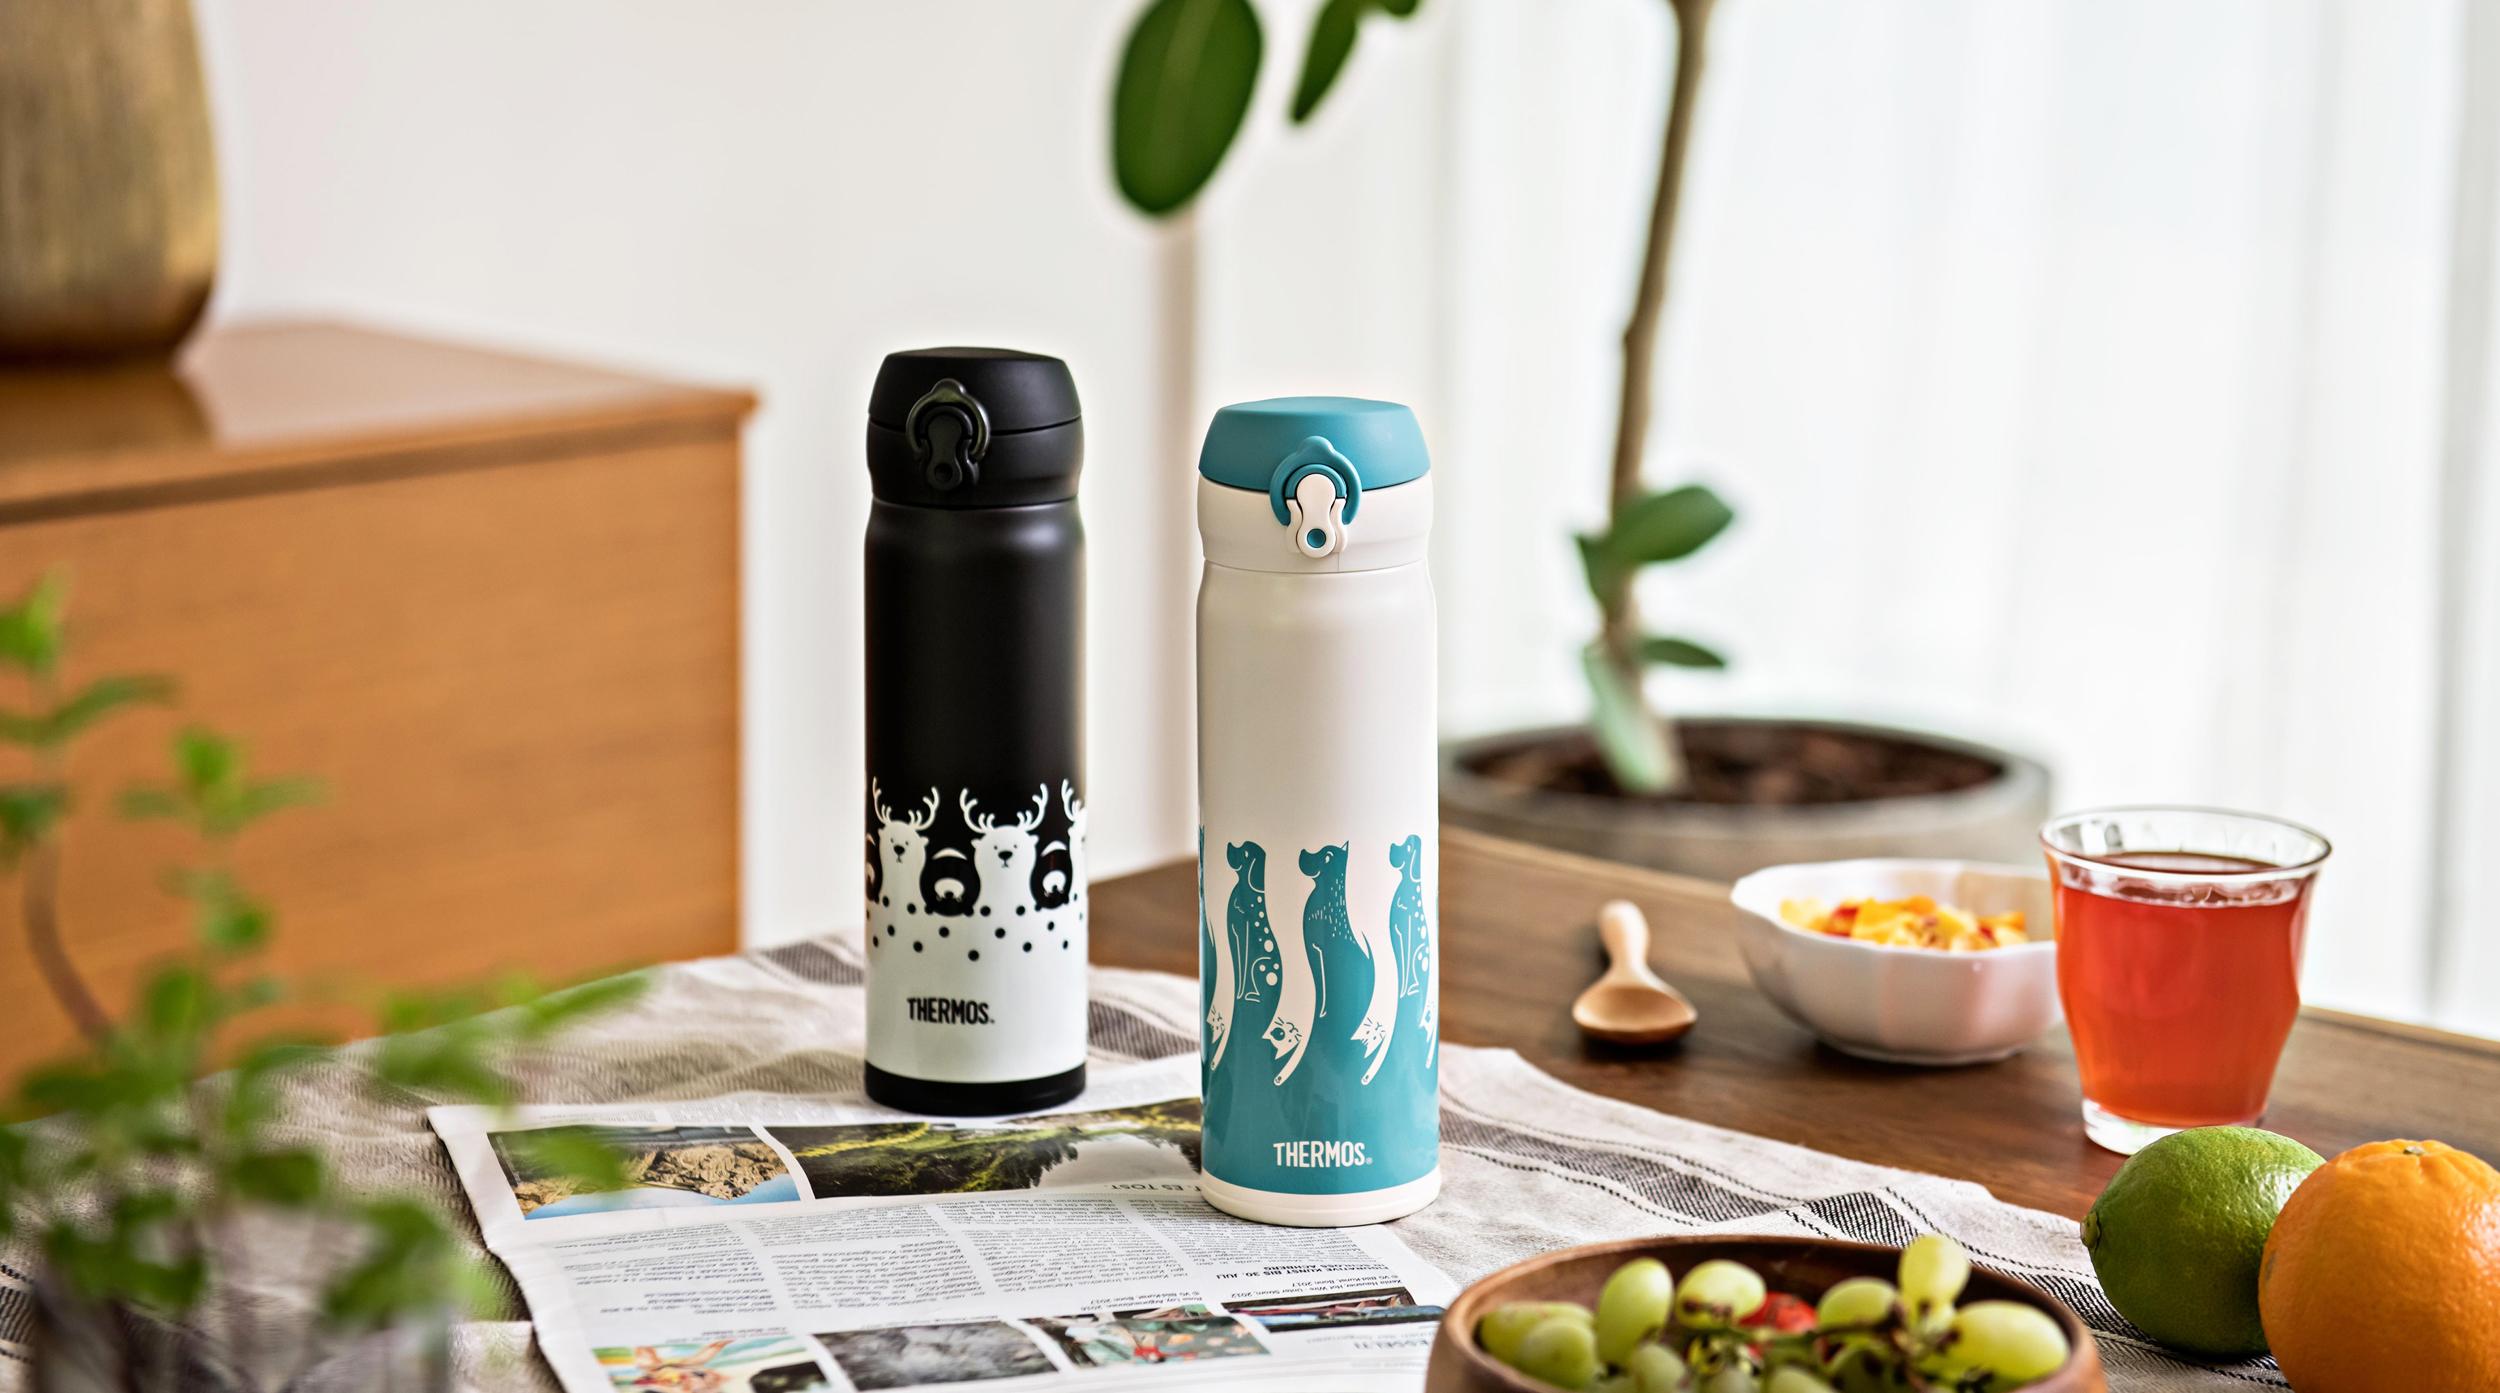 THERMOS 瓶身设计